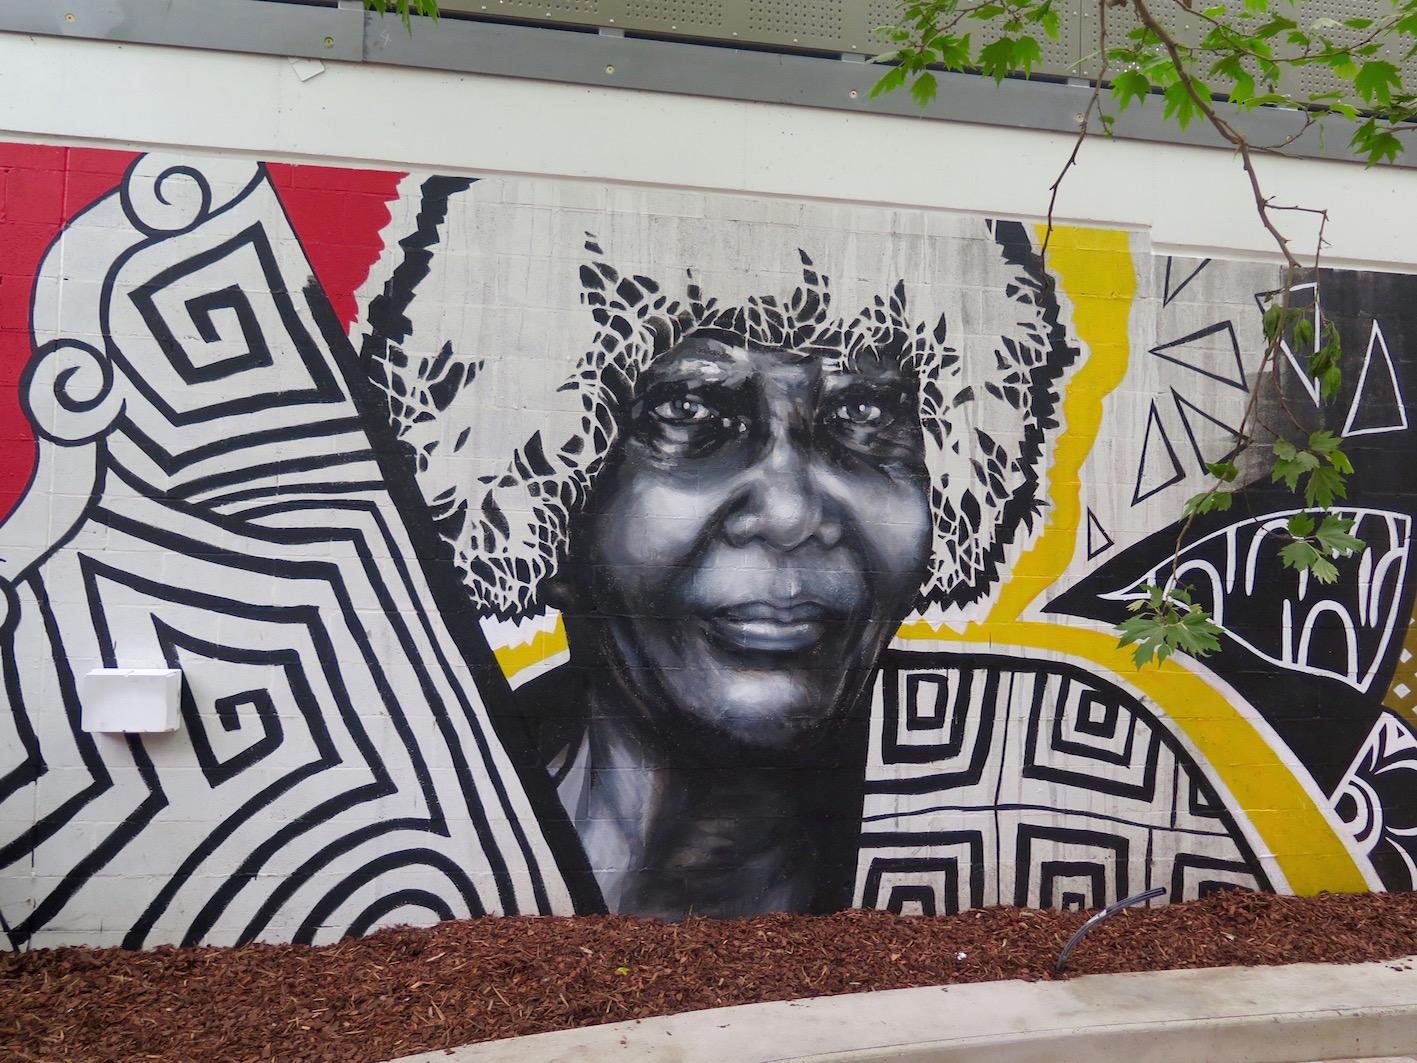 deansunshine_landofsunshine_melbourne_streetart_graffiti_eastland urban art project 9 lucy lucy shannons crees collab 4